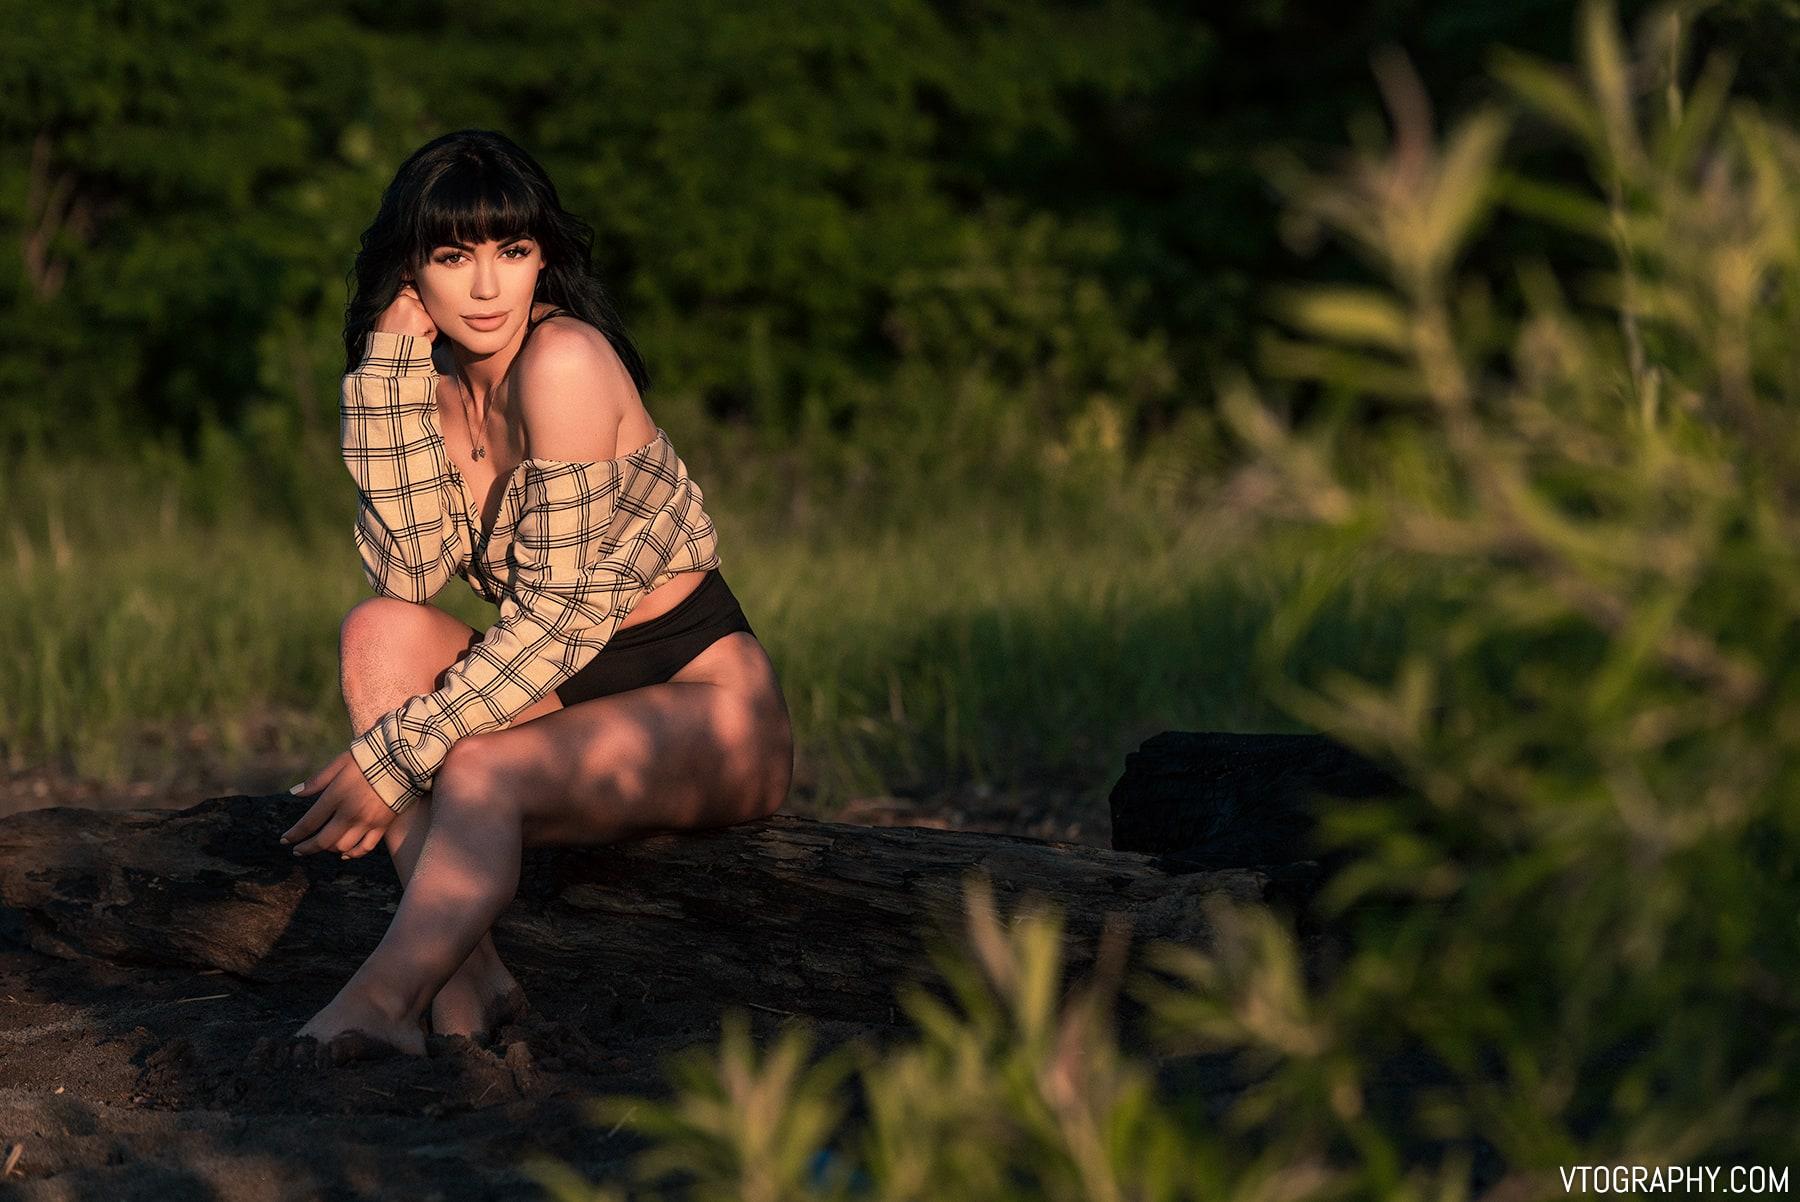 Model sitting on a log with a plaid shirt